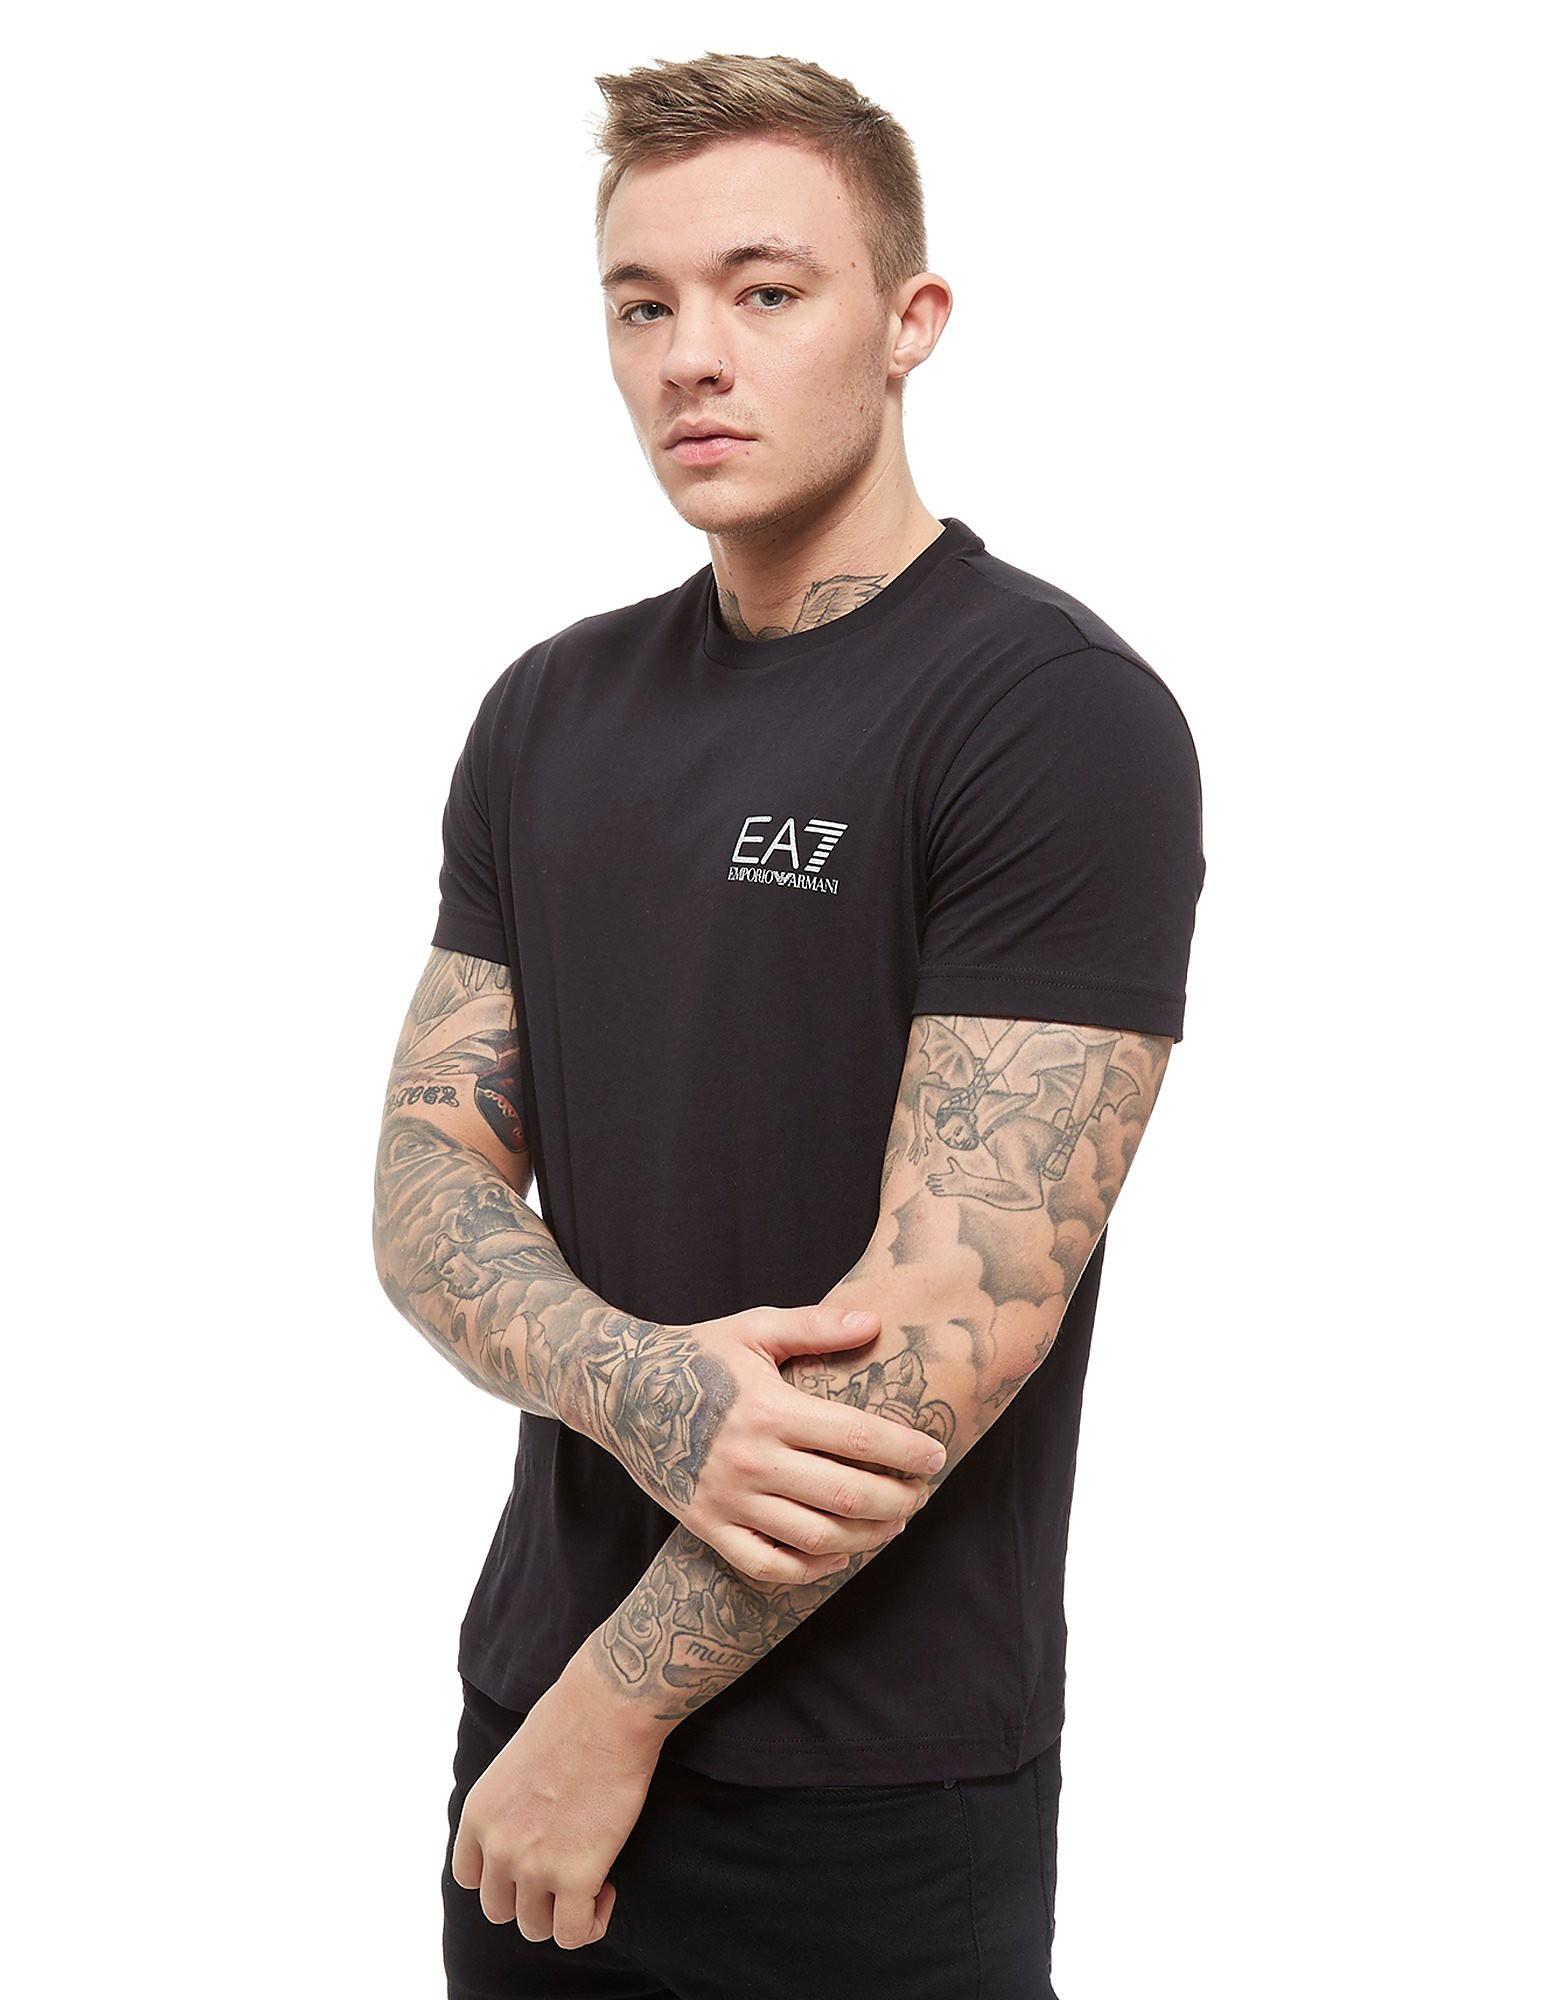 Emporio Armani EA7 Core T-Shirt Homme - Black, Black